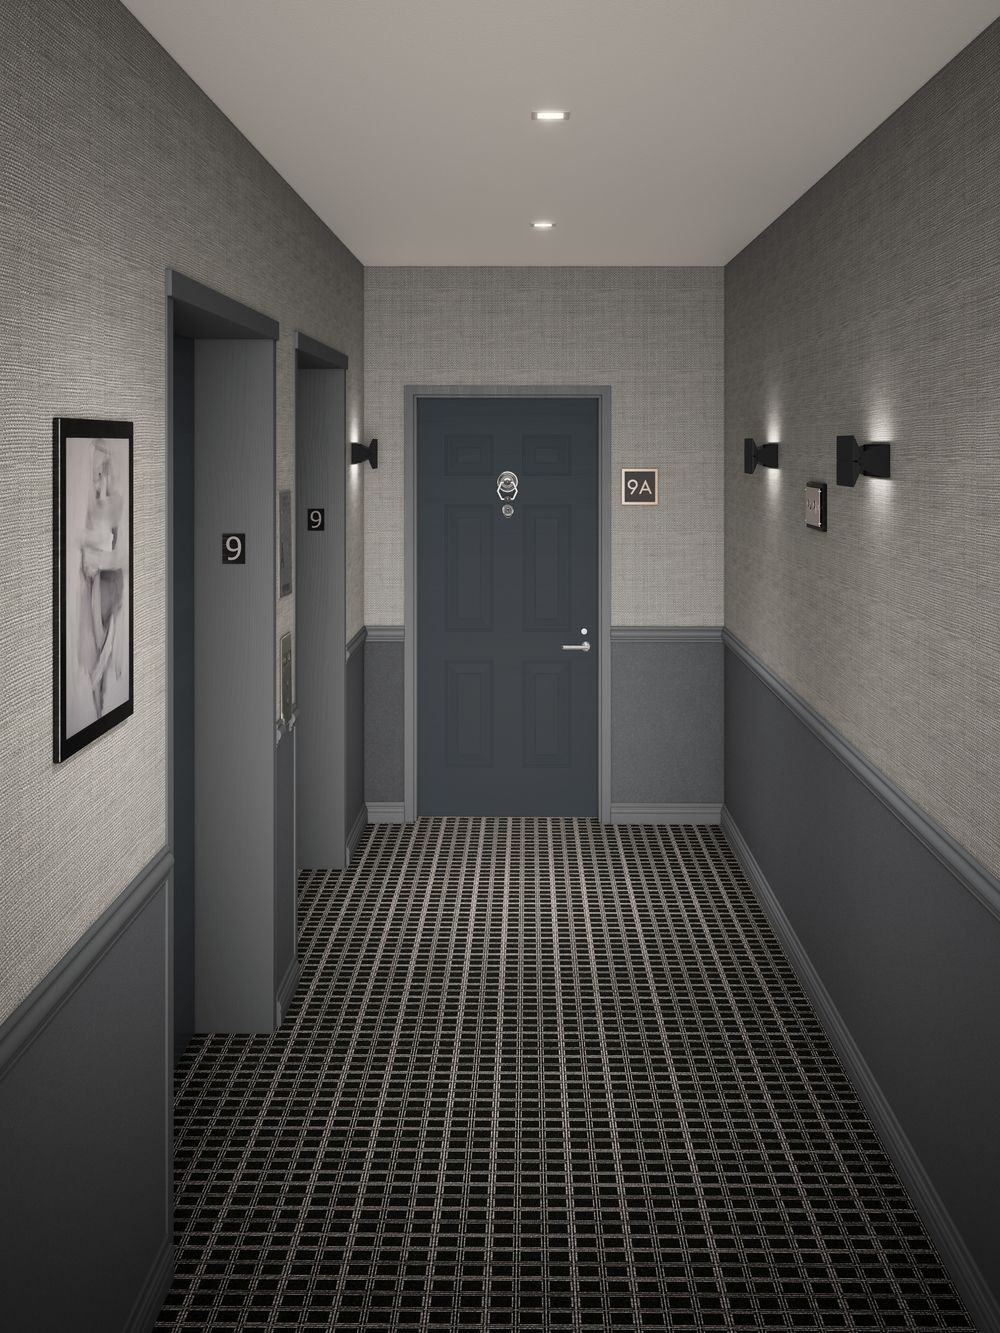 16 Hallway Interior Design Ideas: Murray St Tribeca Condo Hallway